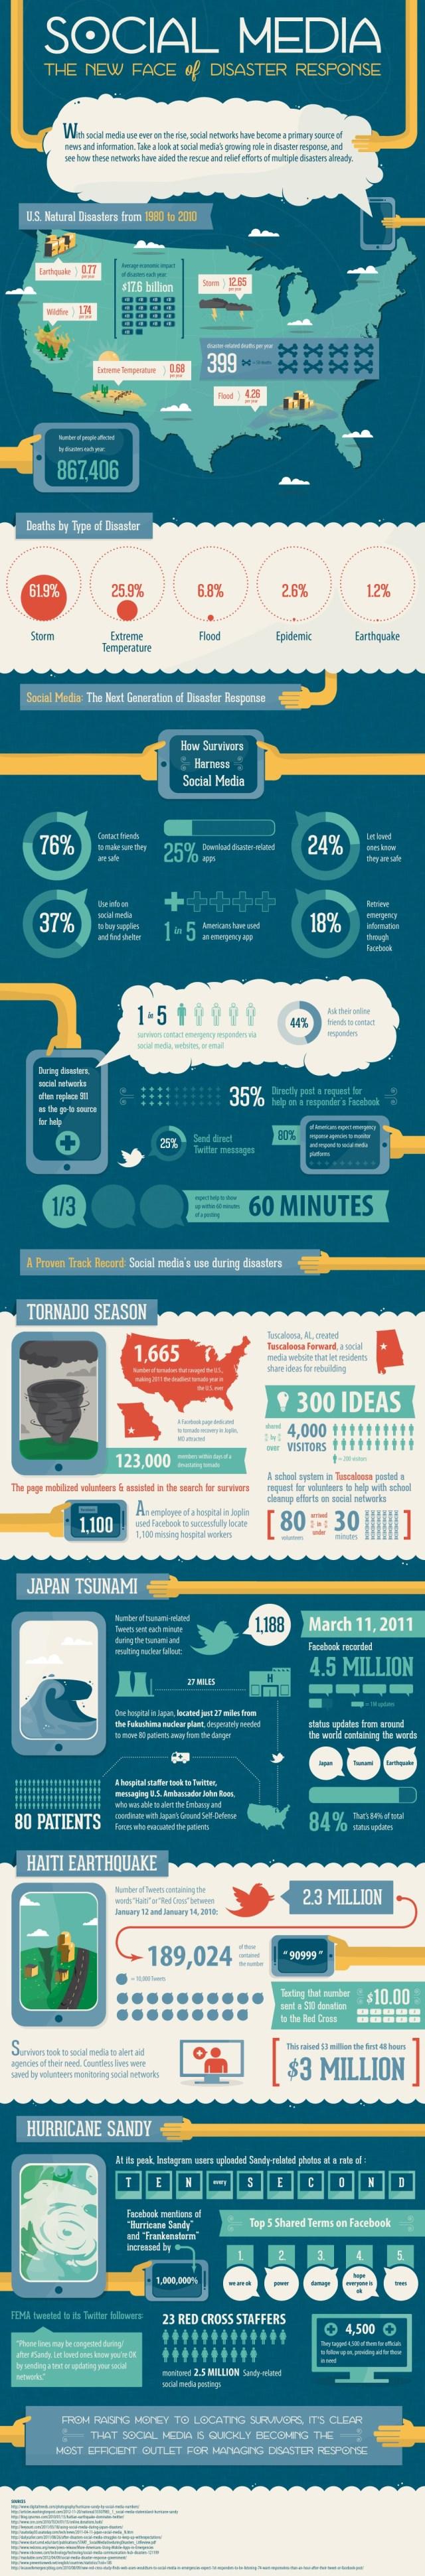 social media the new face of disaster response